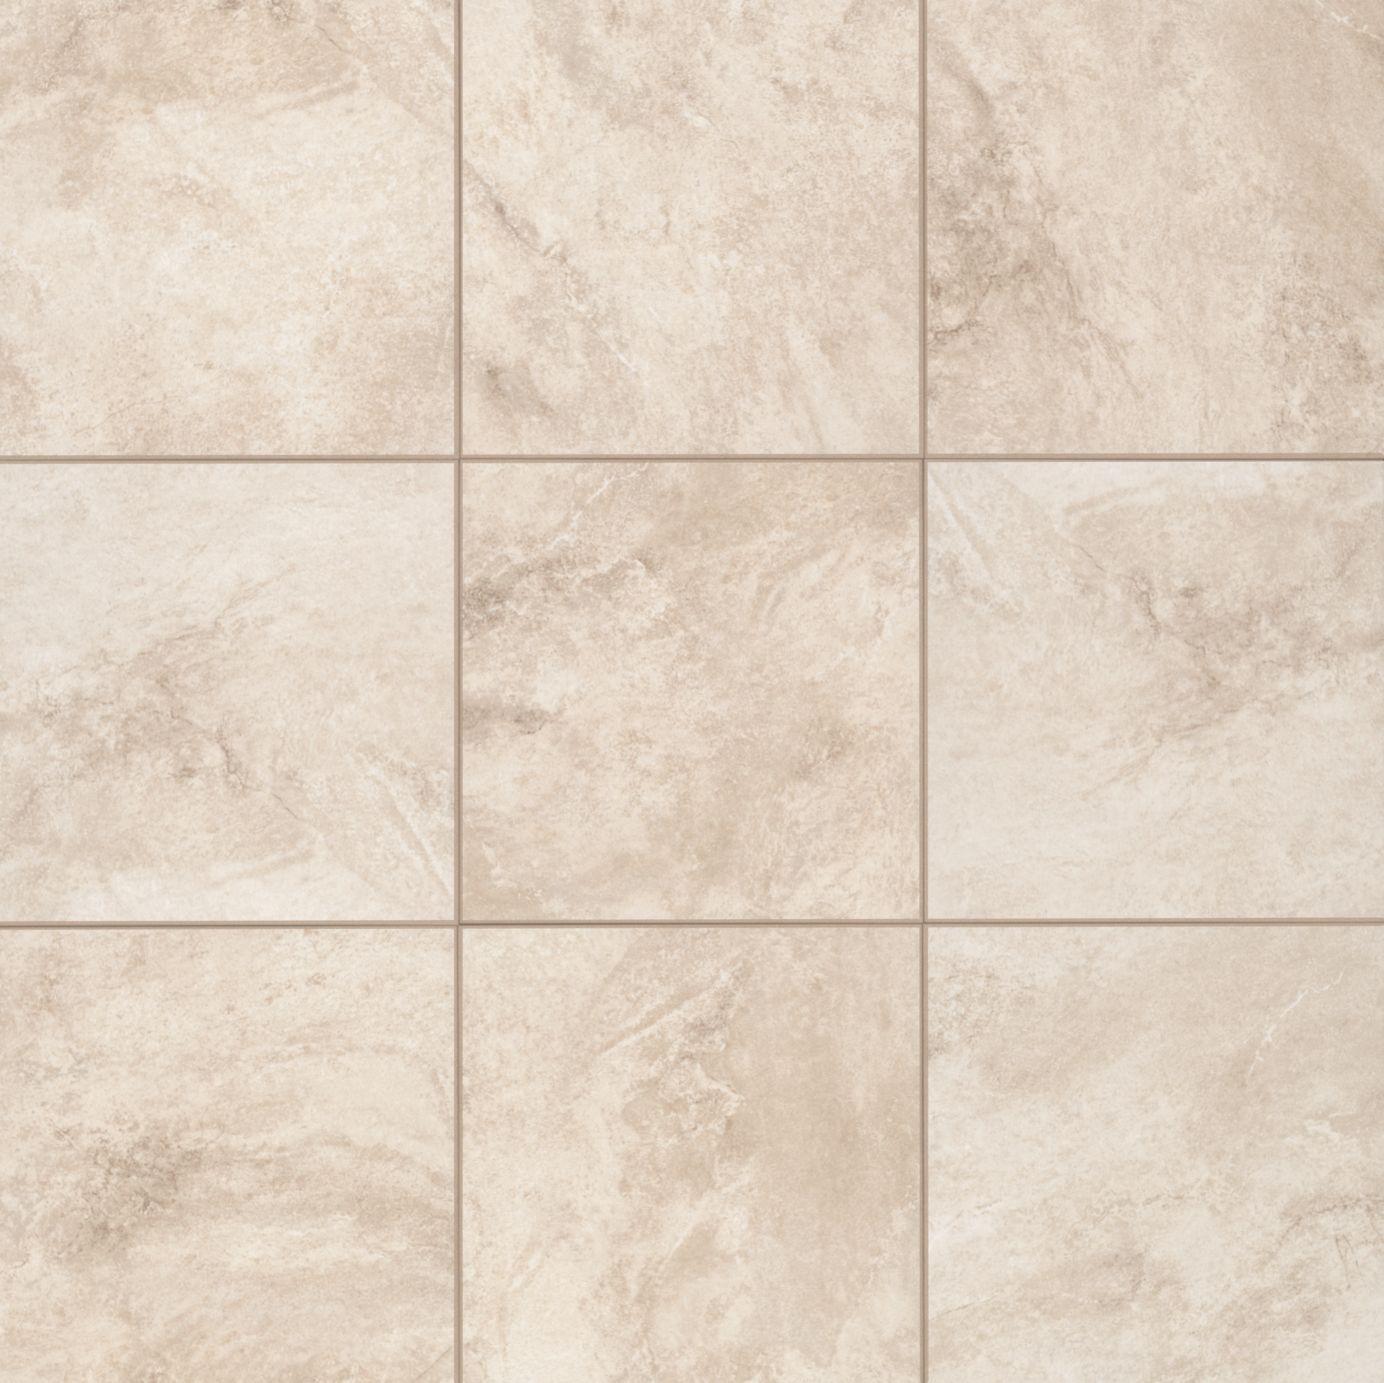 CeramicPorcelainTile Canterra T775F-CE96 Bianco